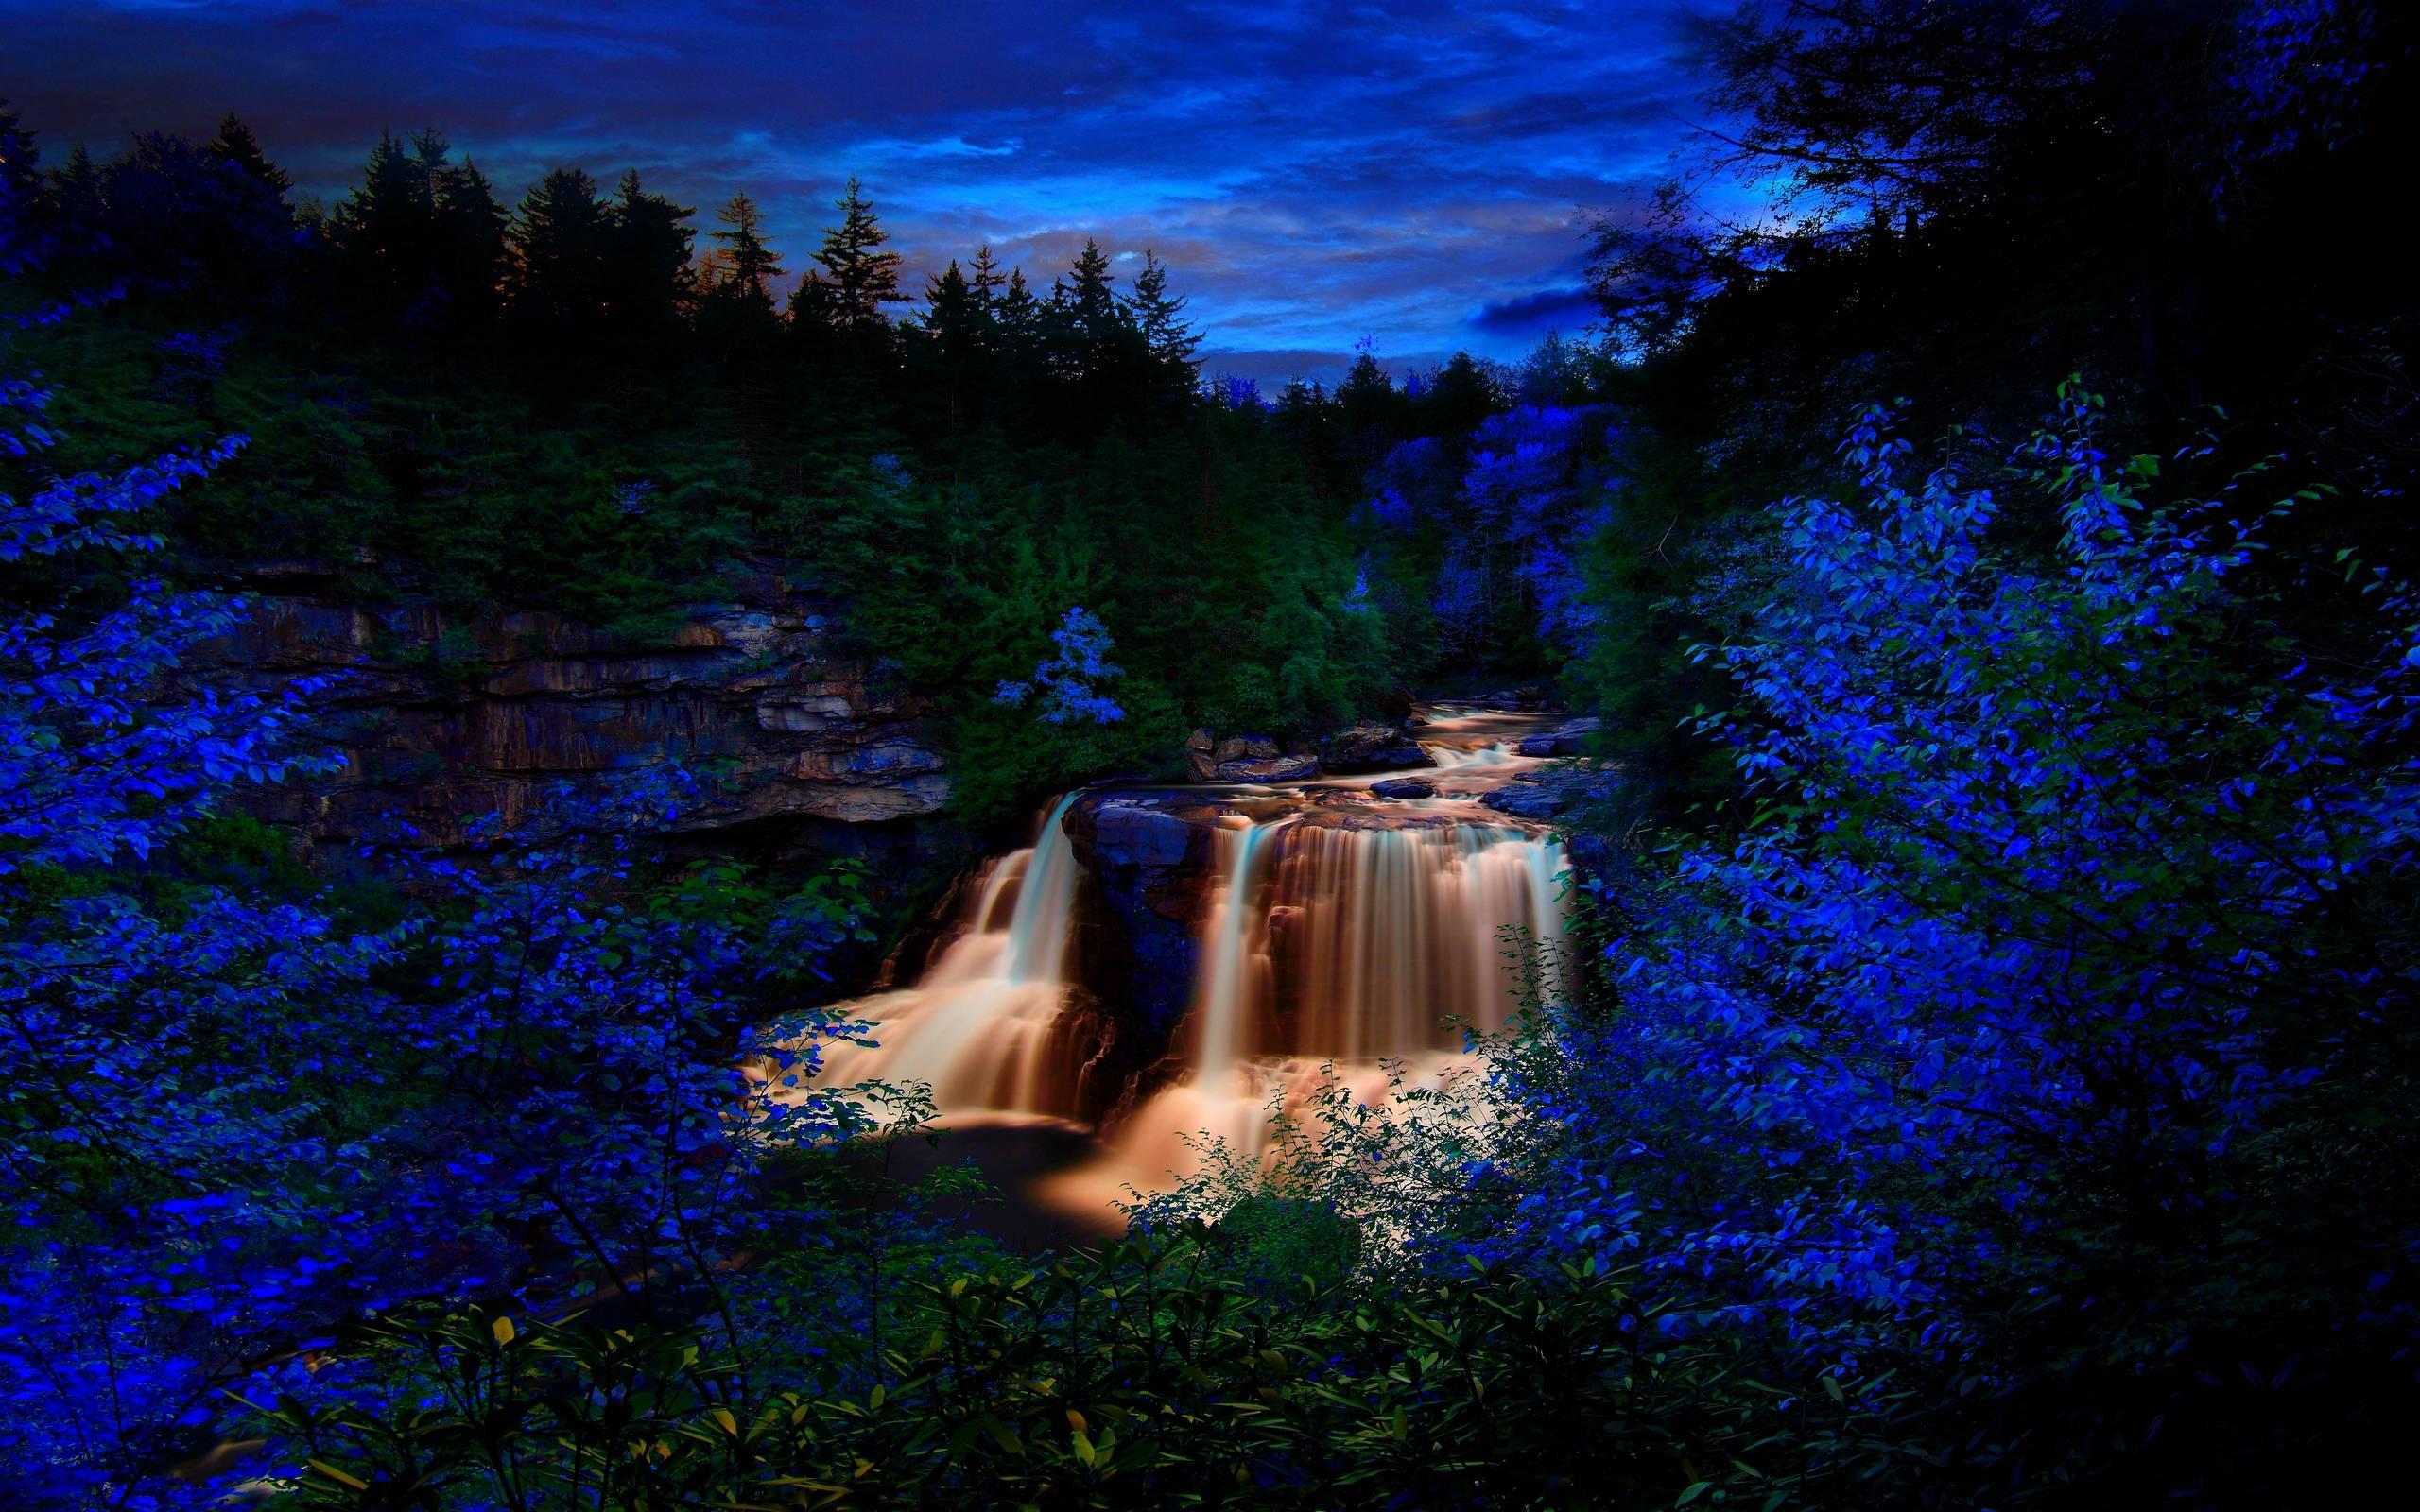 Dream wallpapers wallpaper cave - Waterfalls desktop wallpaper forest falls ...